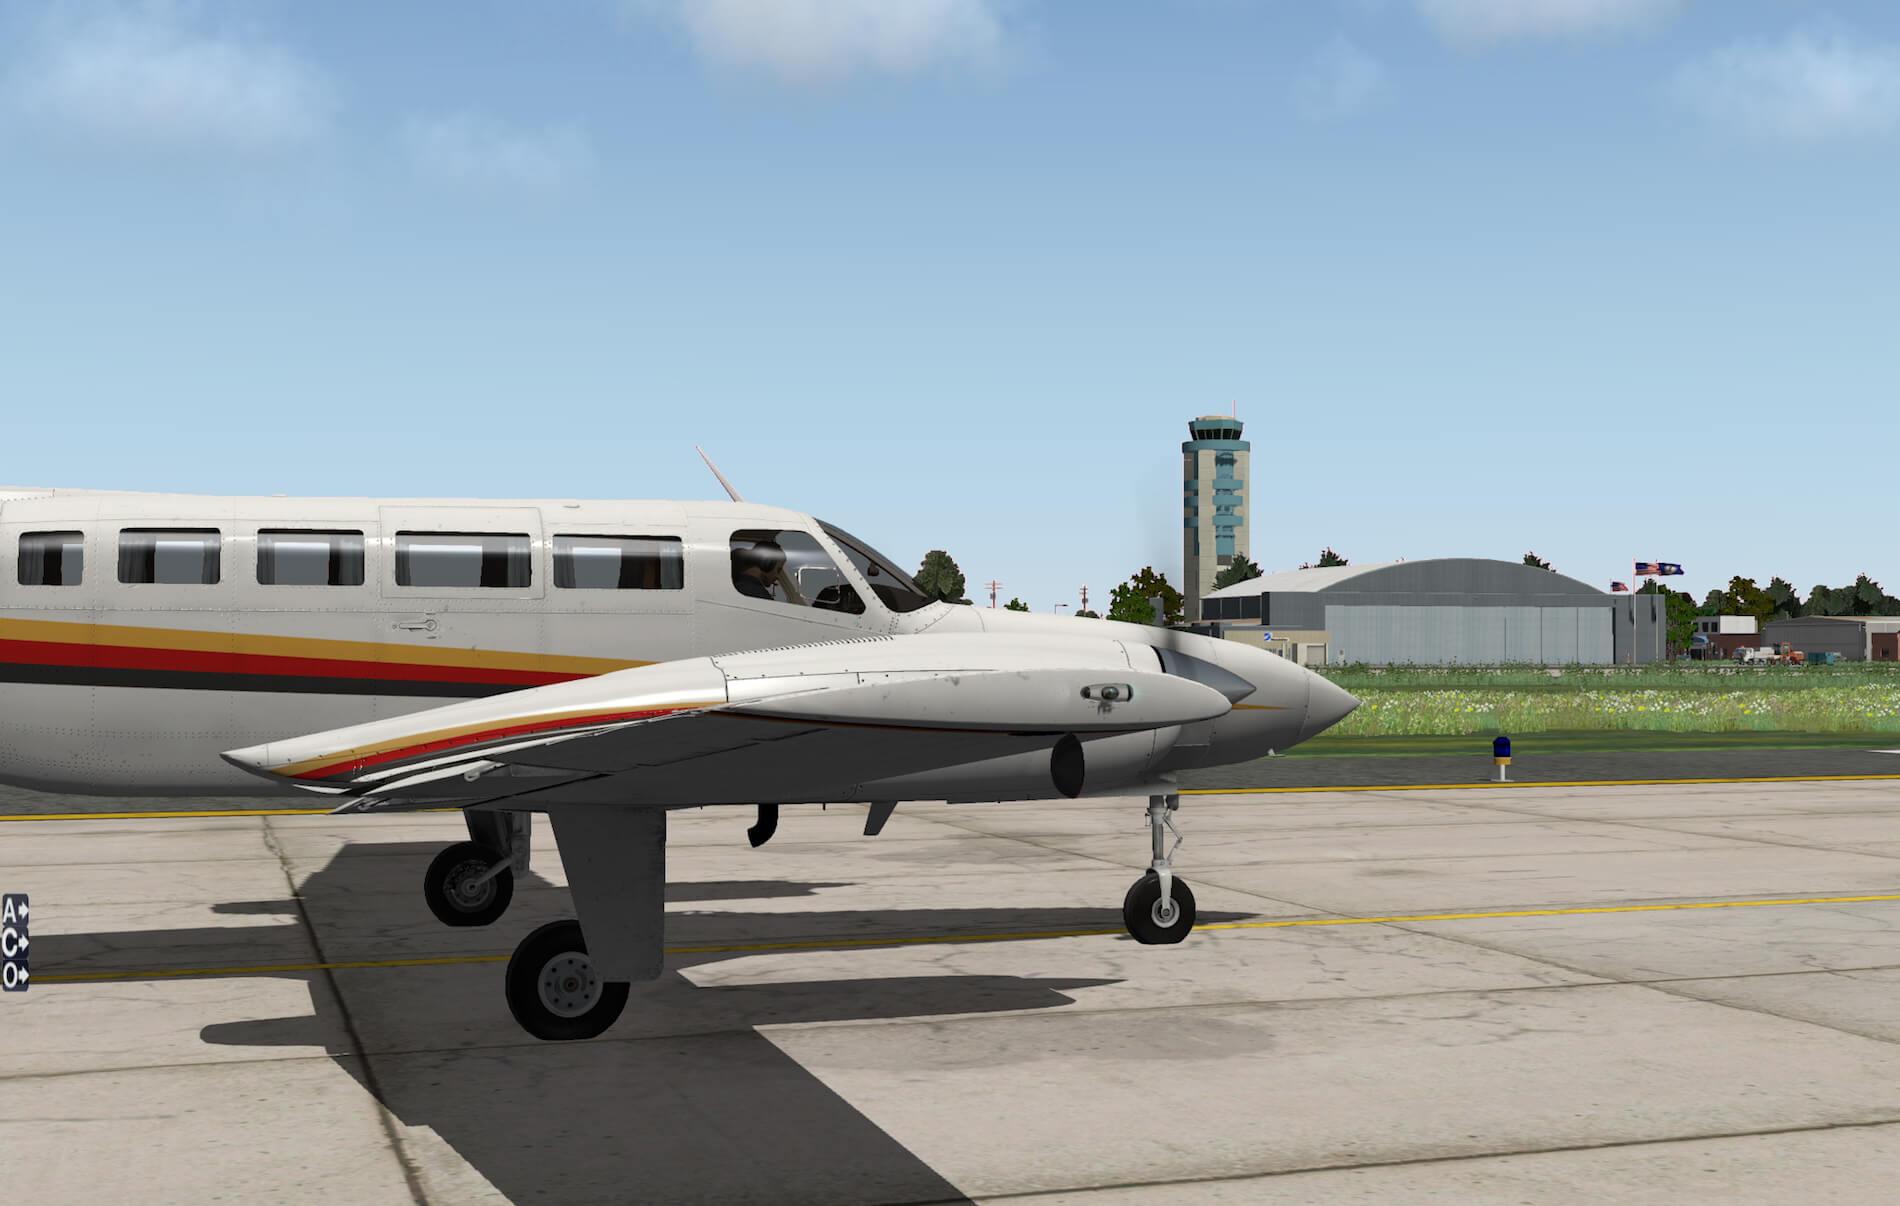 x-plane garmin 430 how to load flight plan